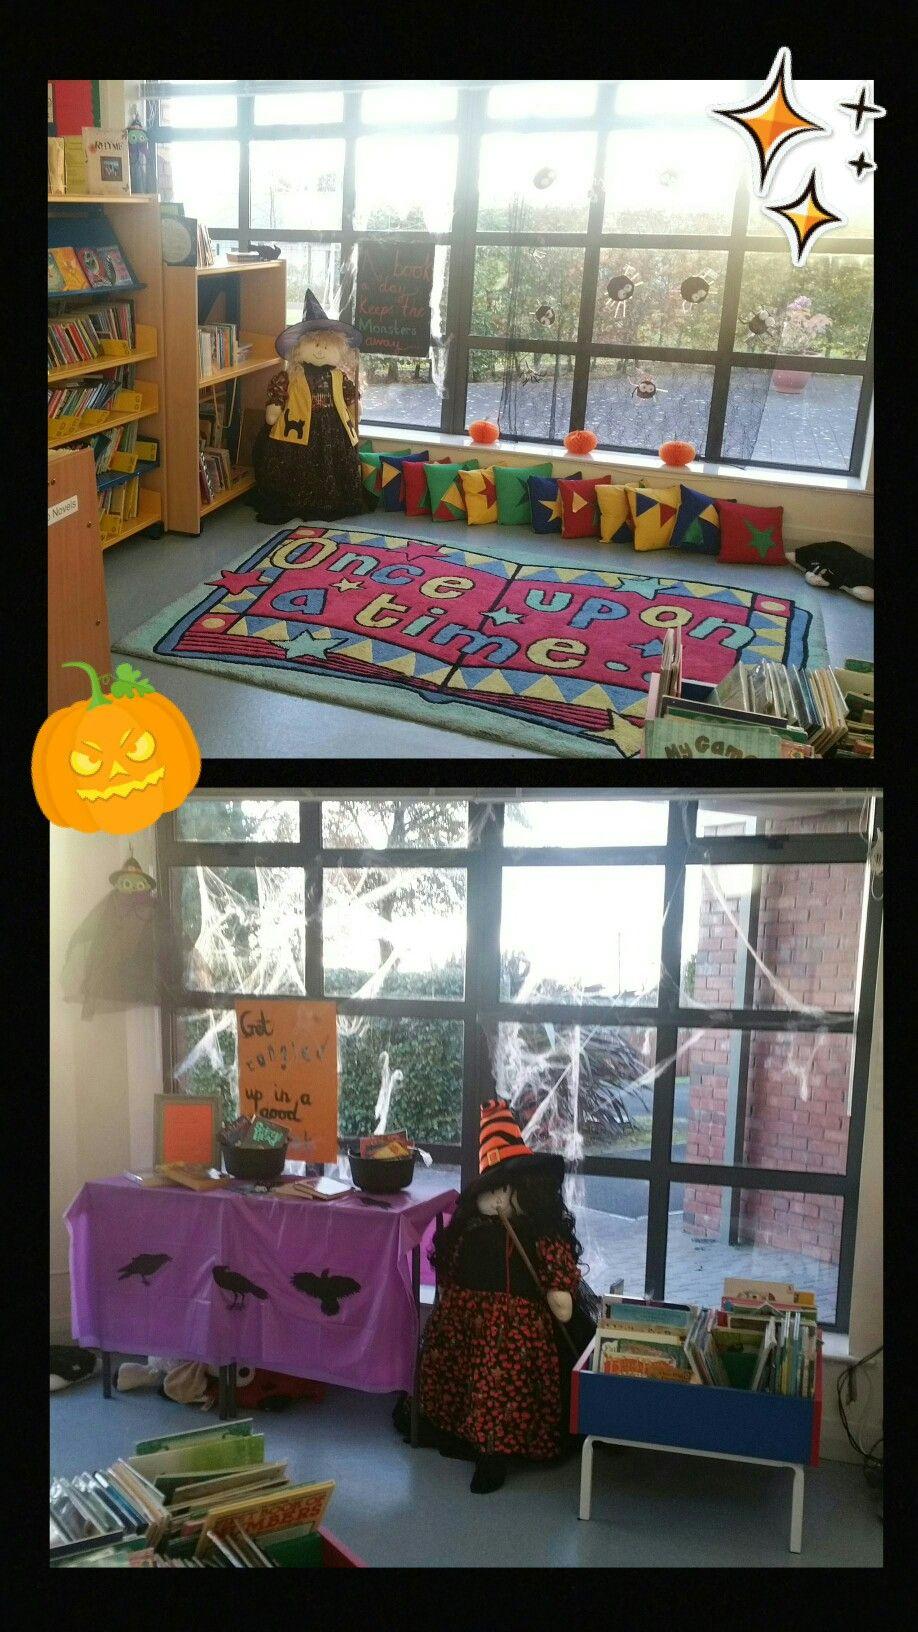 School library at Halloween.